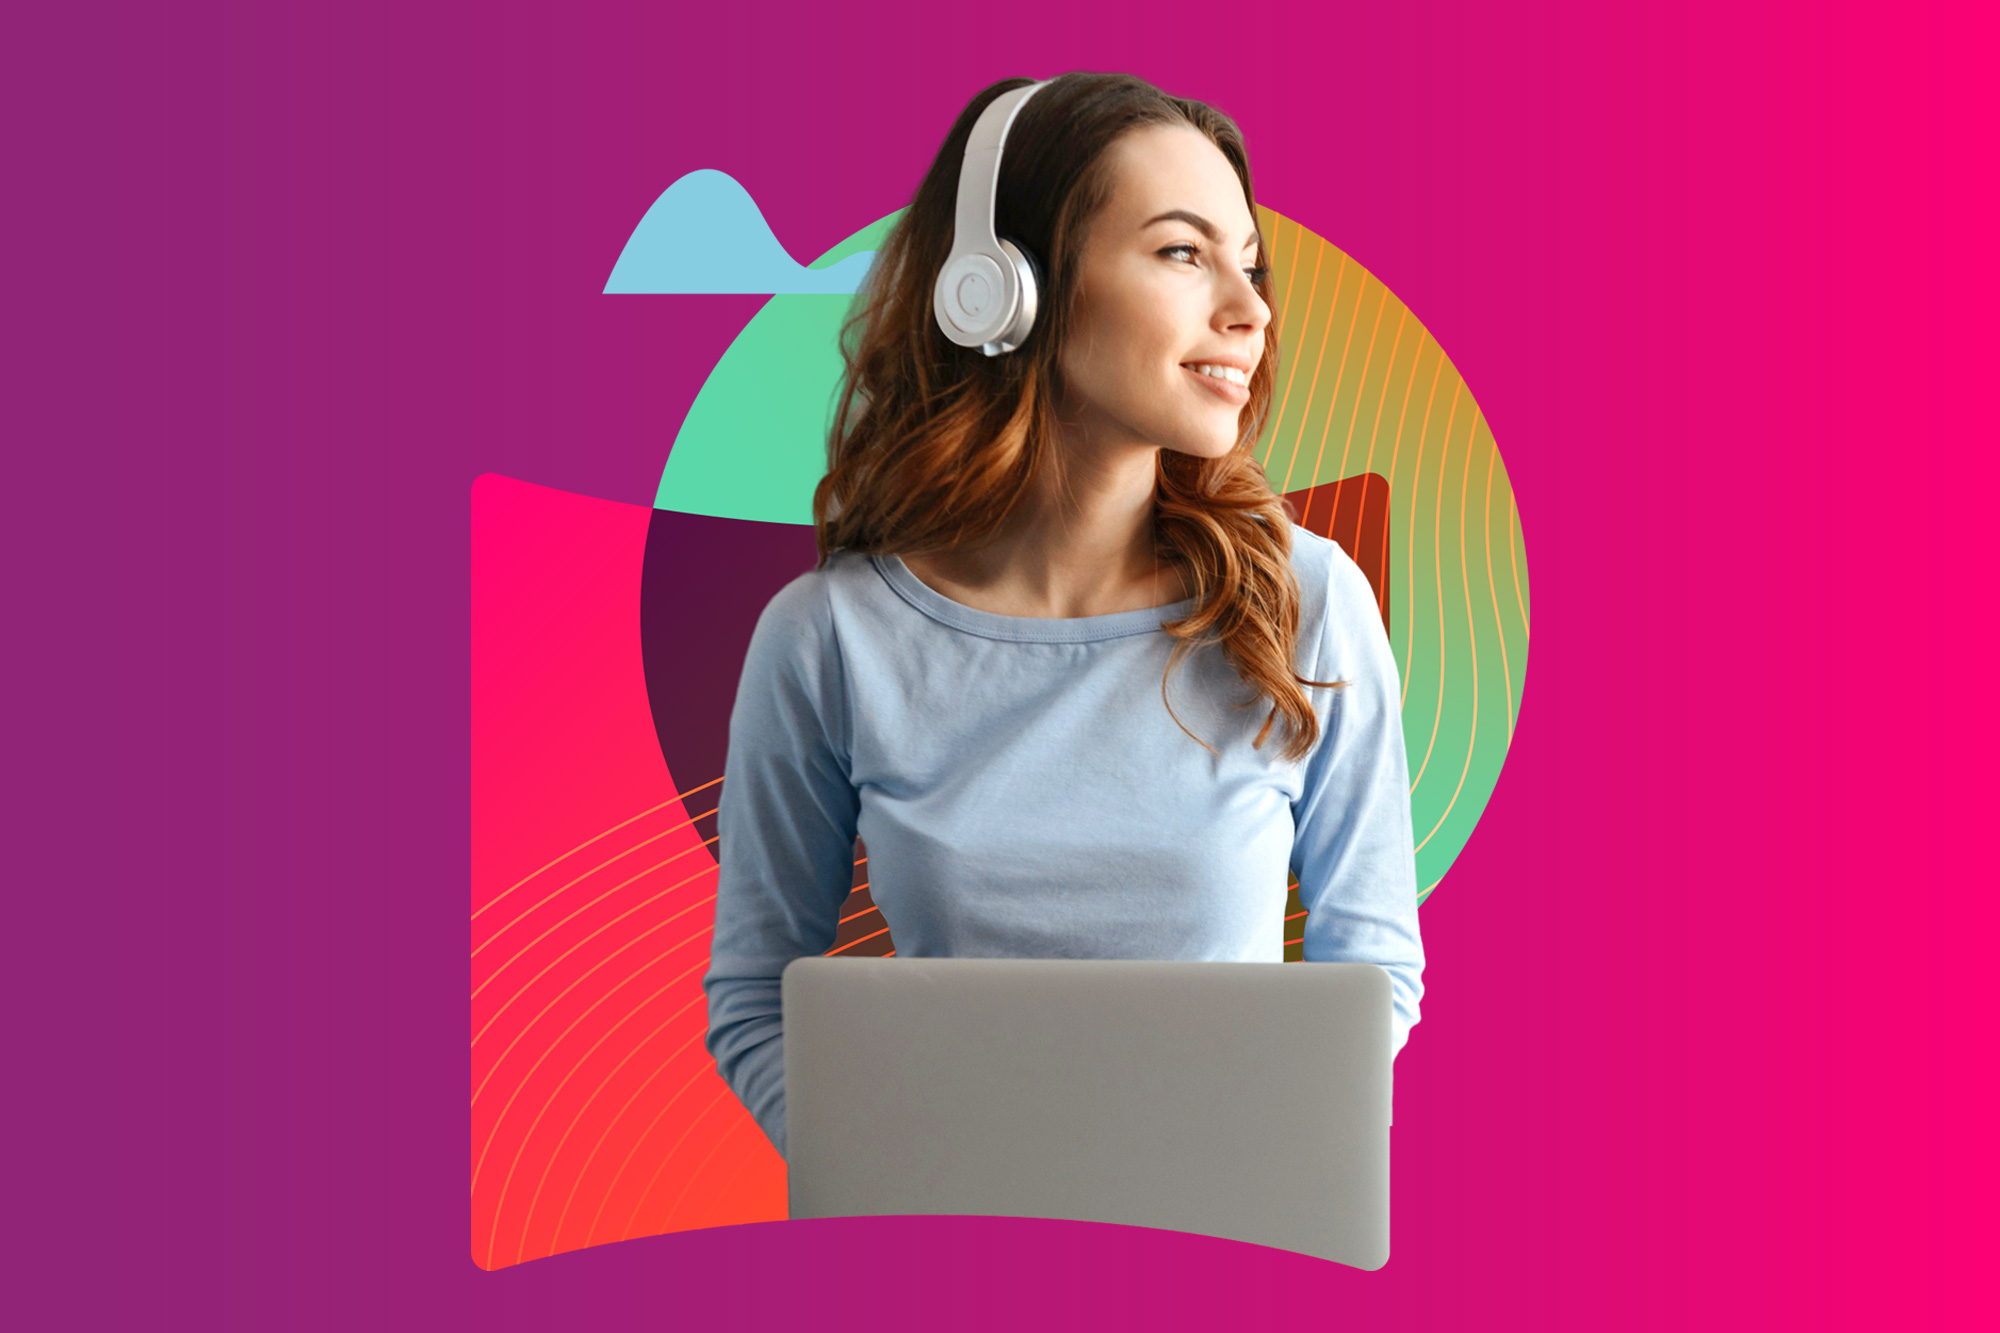 girl laptop izea logo icon cloud